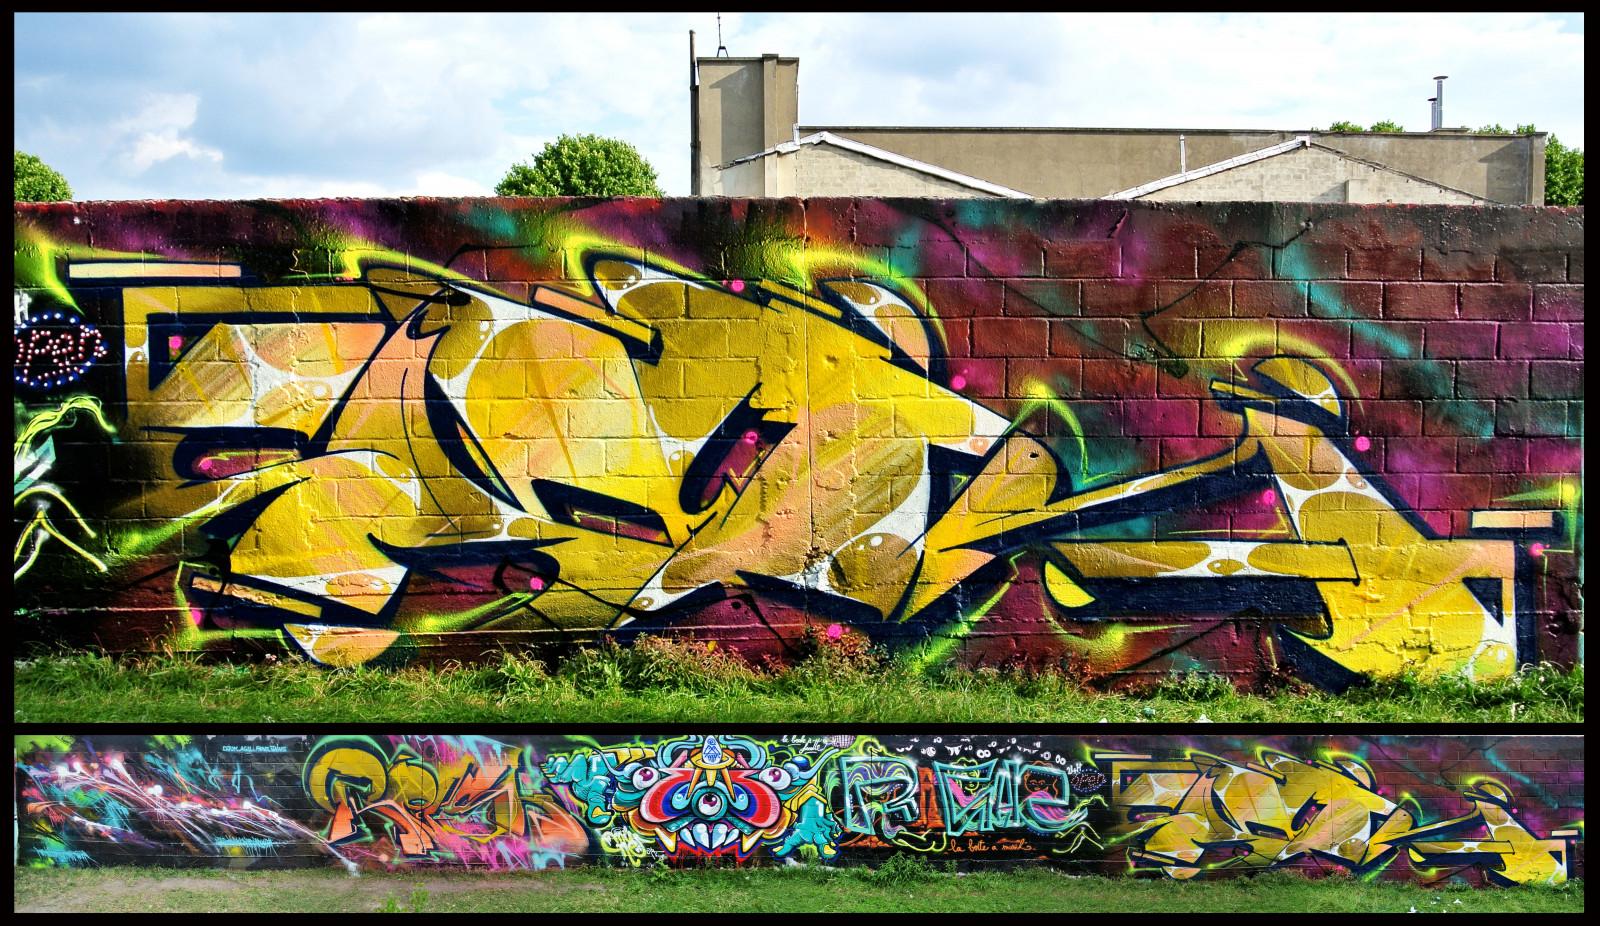 Wallpaper : Yak, Terrain, Paris, France, ART, Colors, Wall, Writing,  Painting, Graffiti, Character, Fat, Tag, Letters, Can, Spot, Peinture,  Writer, Graff, ...